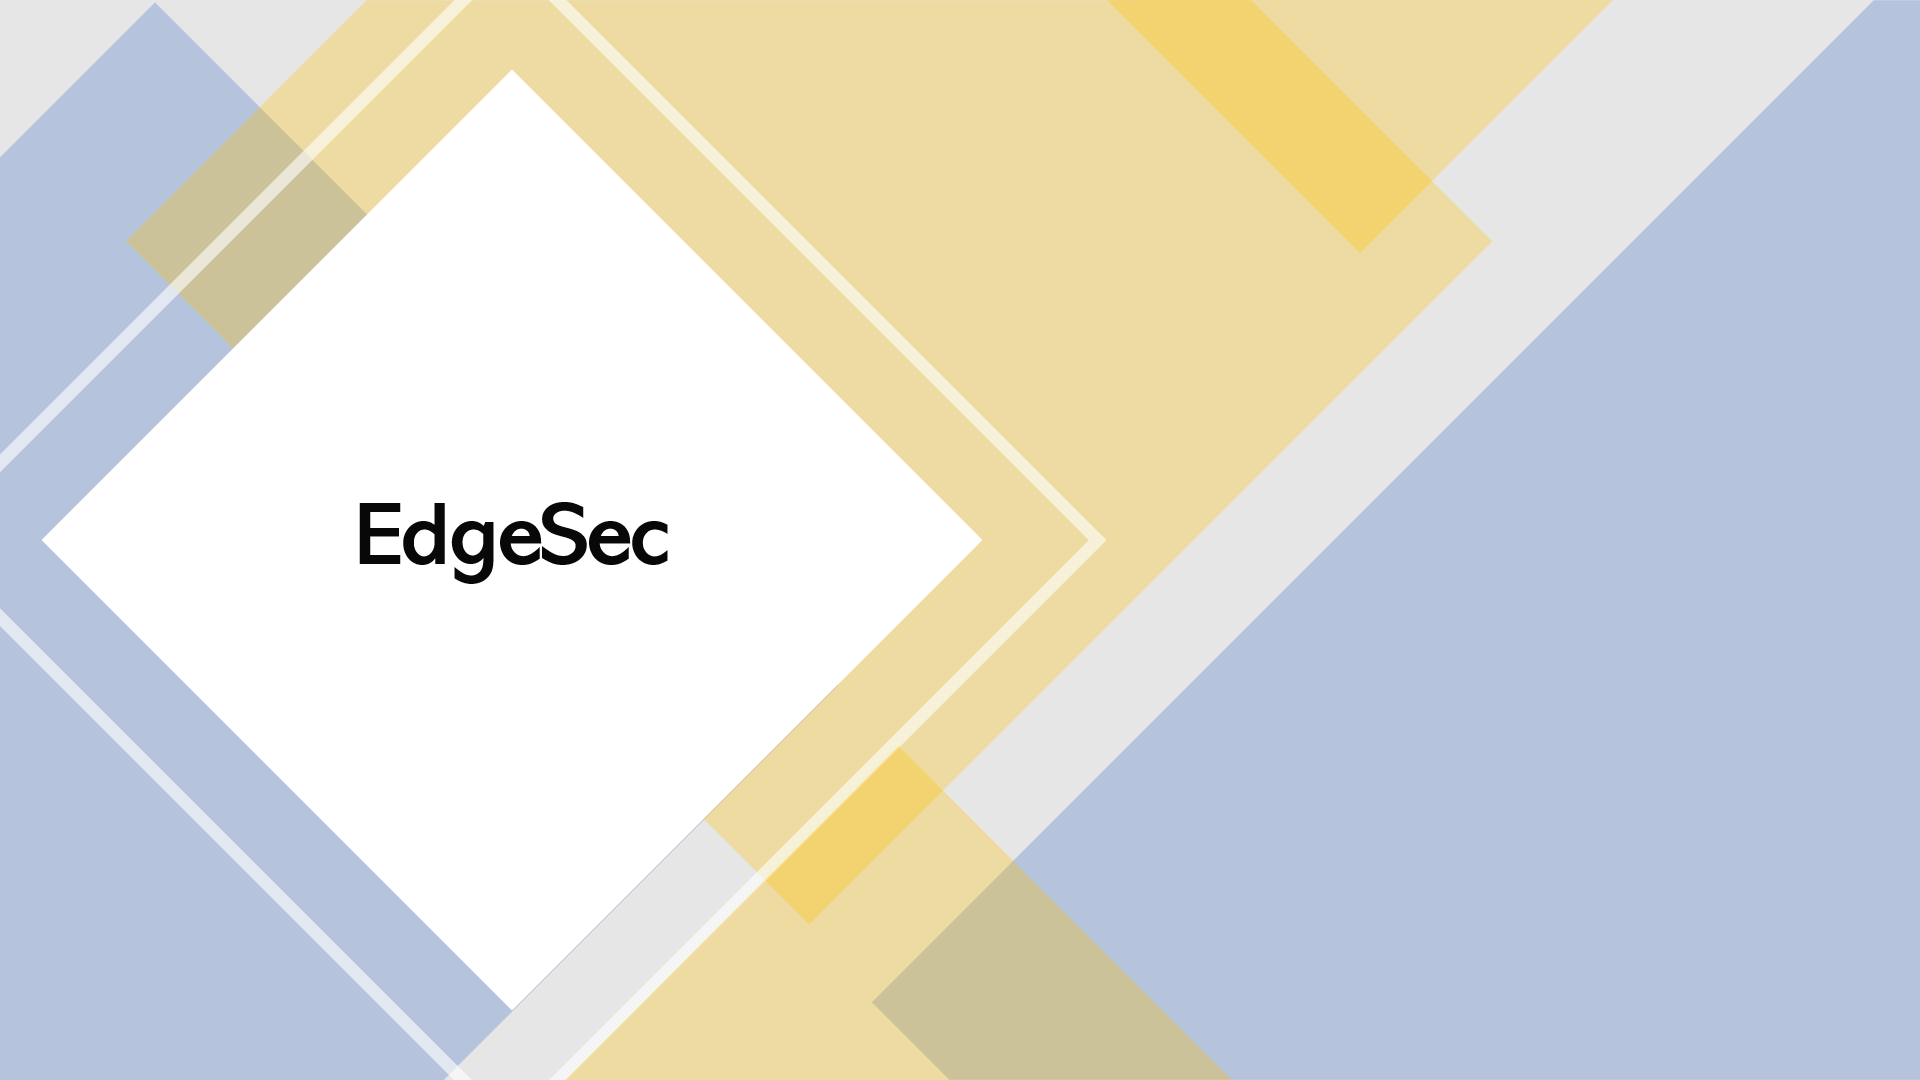 EdgeSec